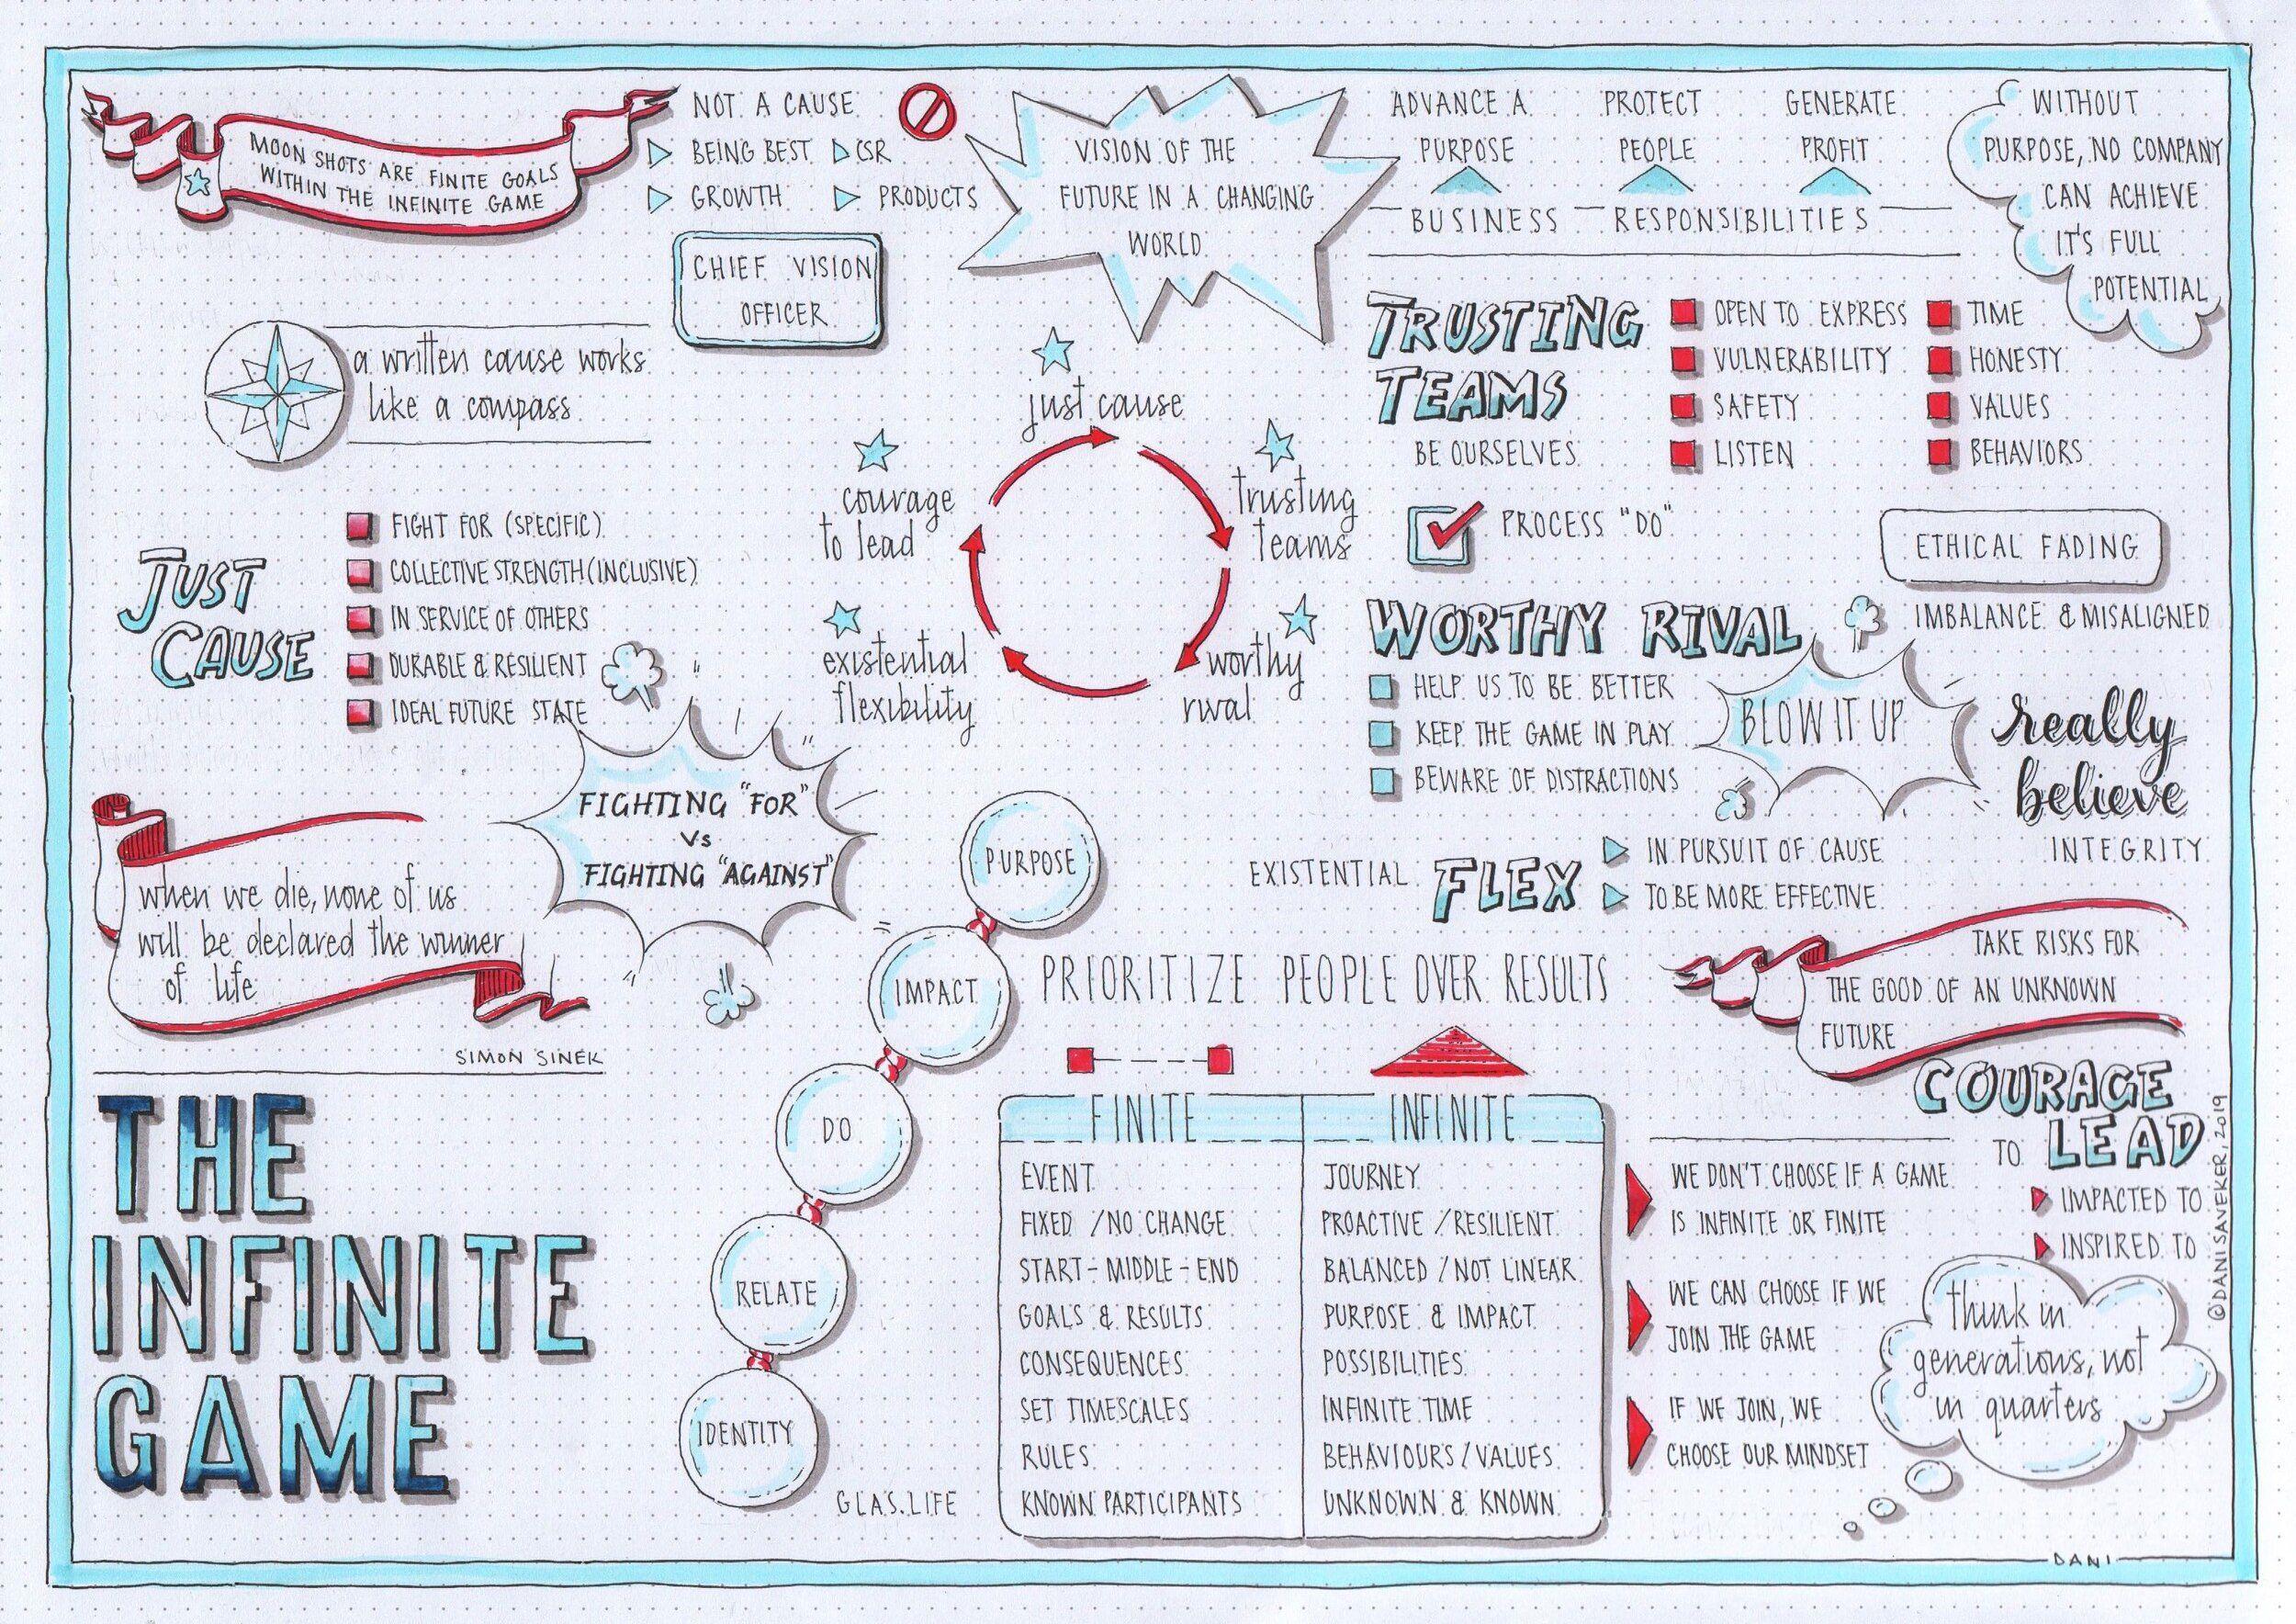 The Infinite Game (Simon Sinek) visual synopsis by Dani